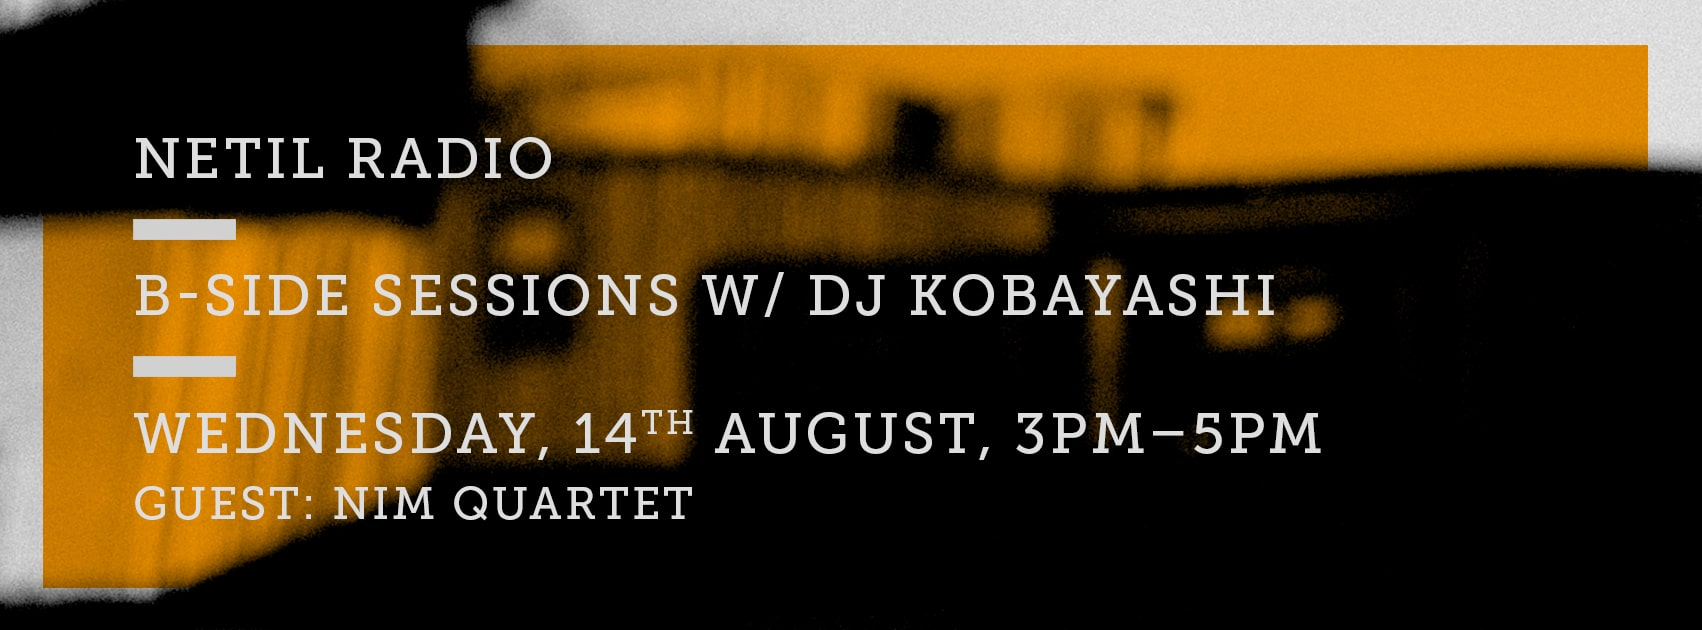 B-Side Sessions at Netil Radio w/DJ Kobayashi / Nim Sadot 1